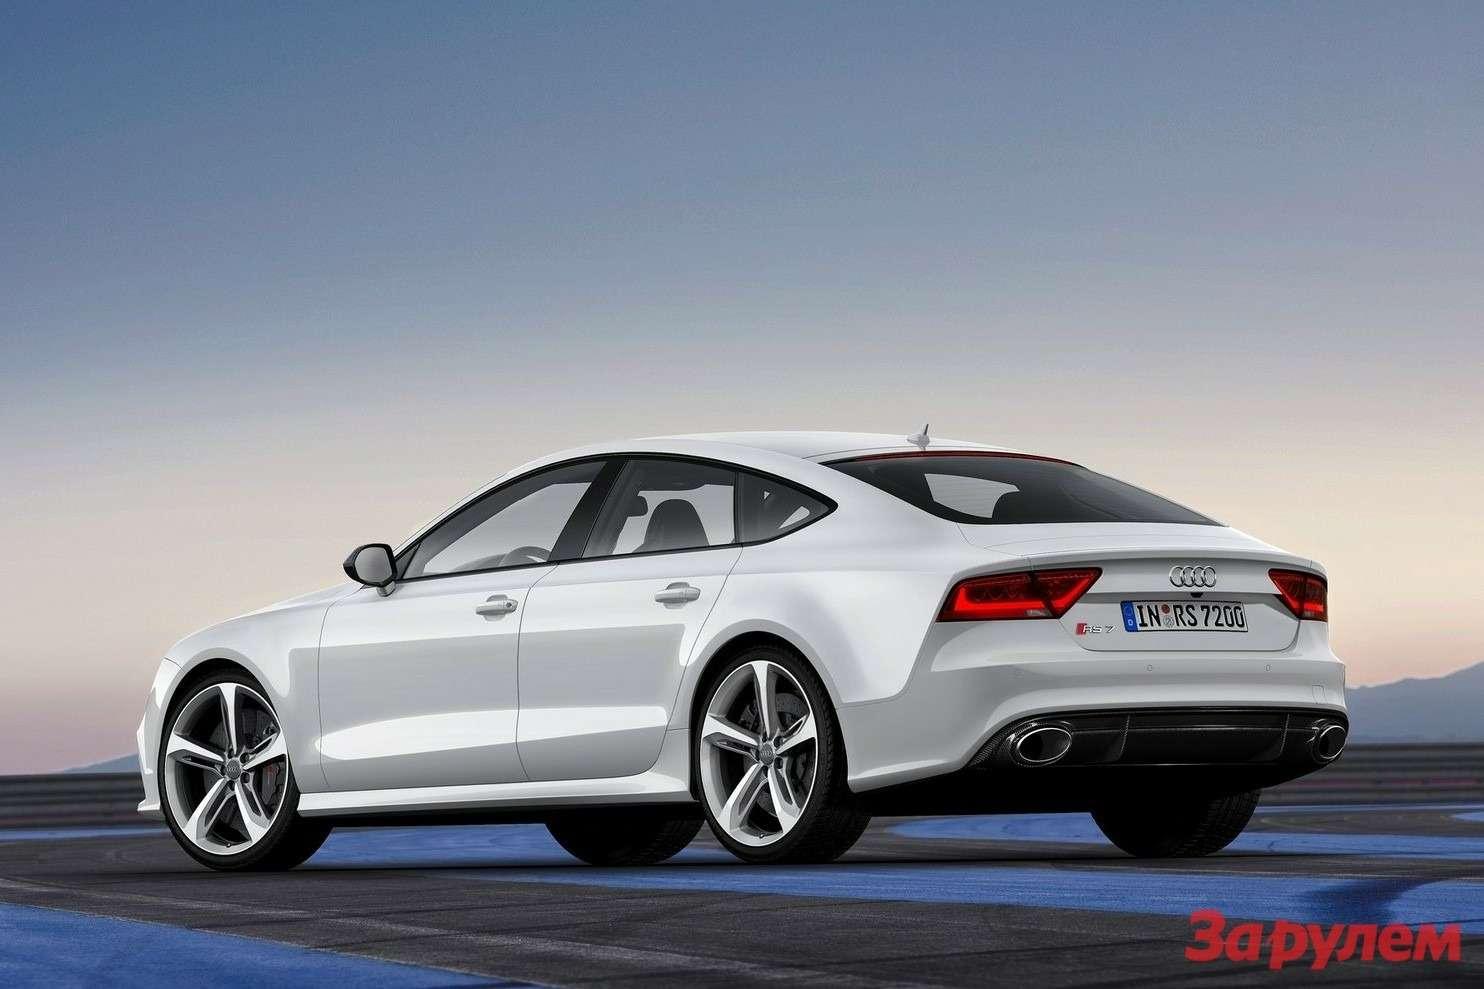 Audi-RS7_Sportback_2014_1600x1200_wallpaper_04